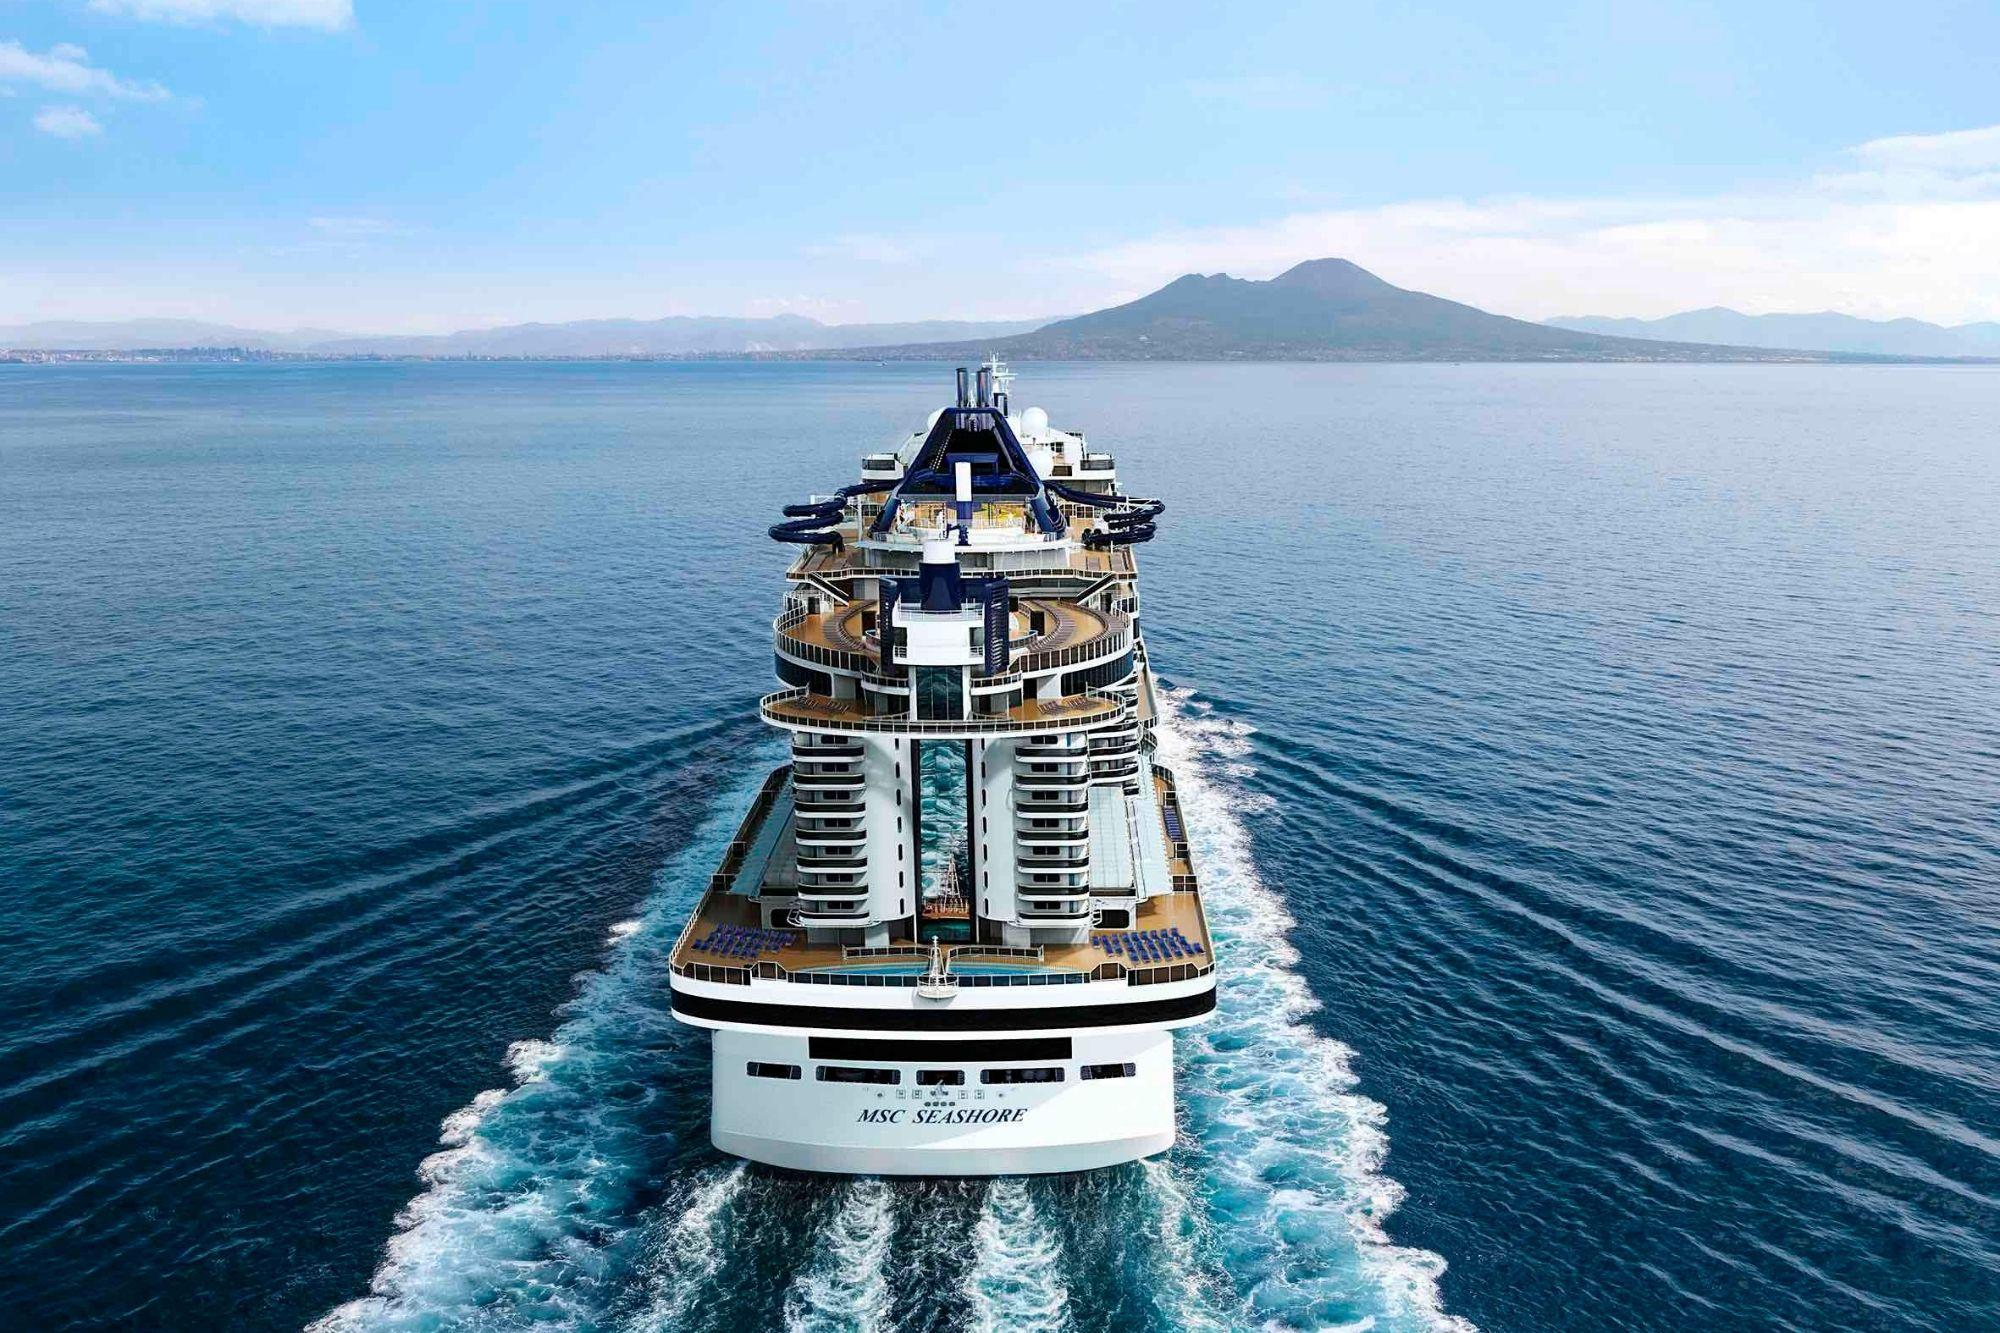 MSC Cruises: Neue Details & Bilder zur MSC Seashore